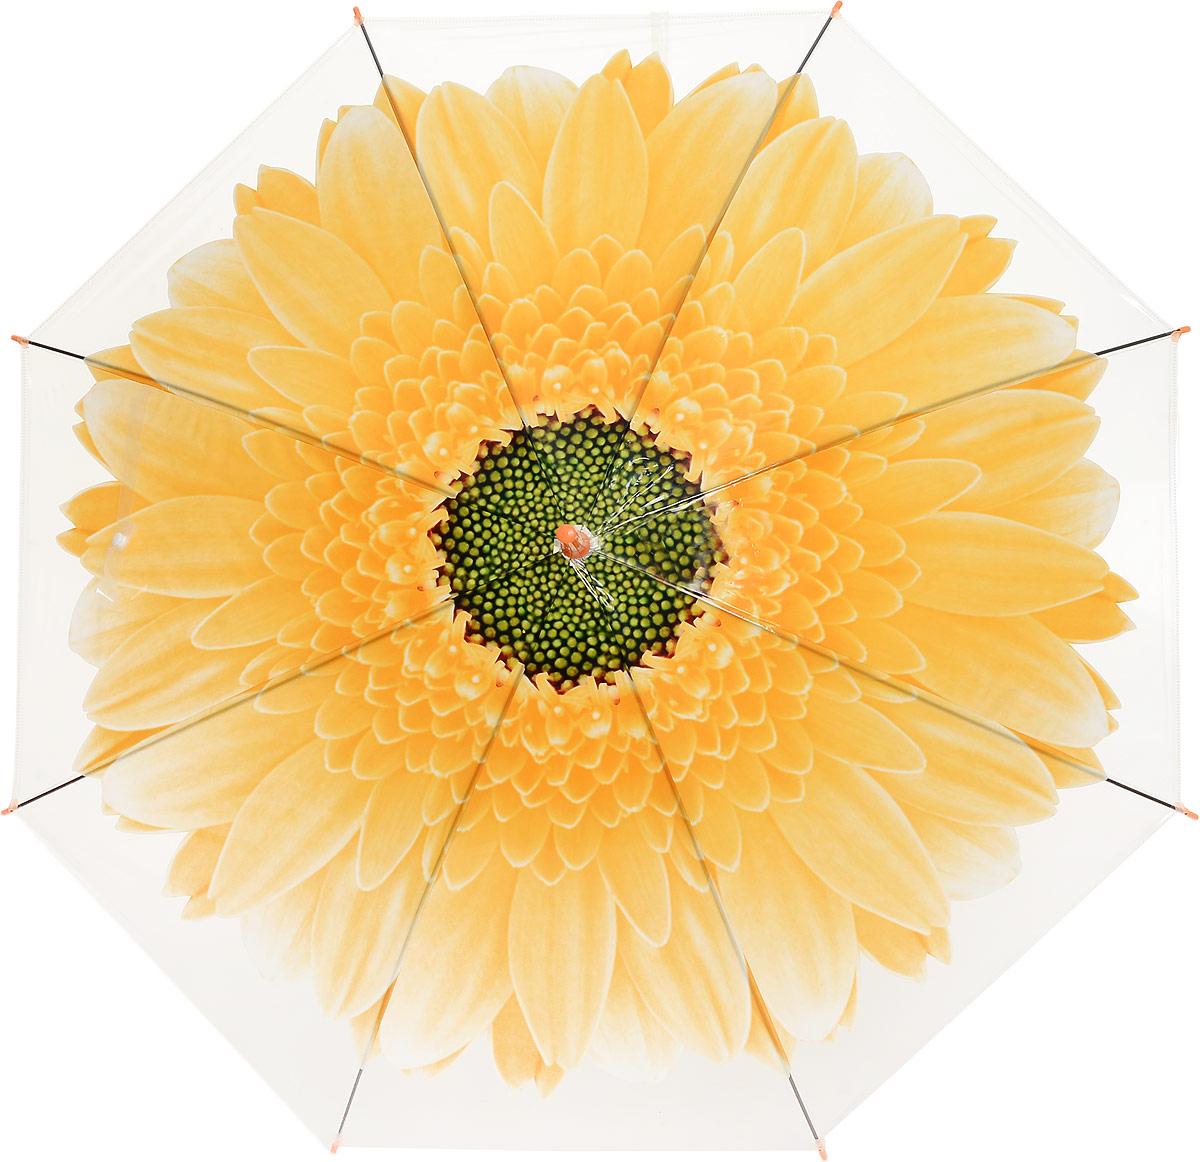 Зонт женский Эврика Цветок, цвет: желтый, белый. 97859 зонт эврика цветок 1 97856